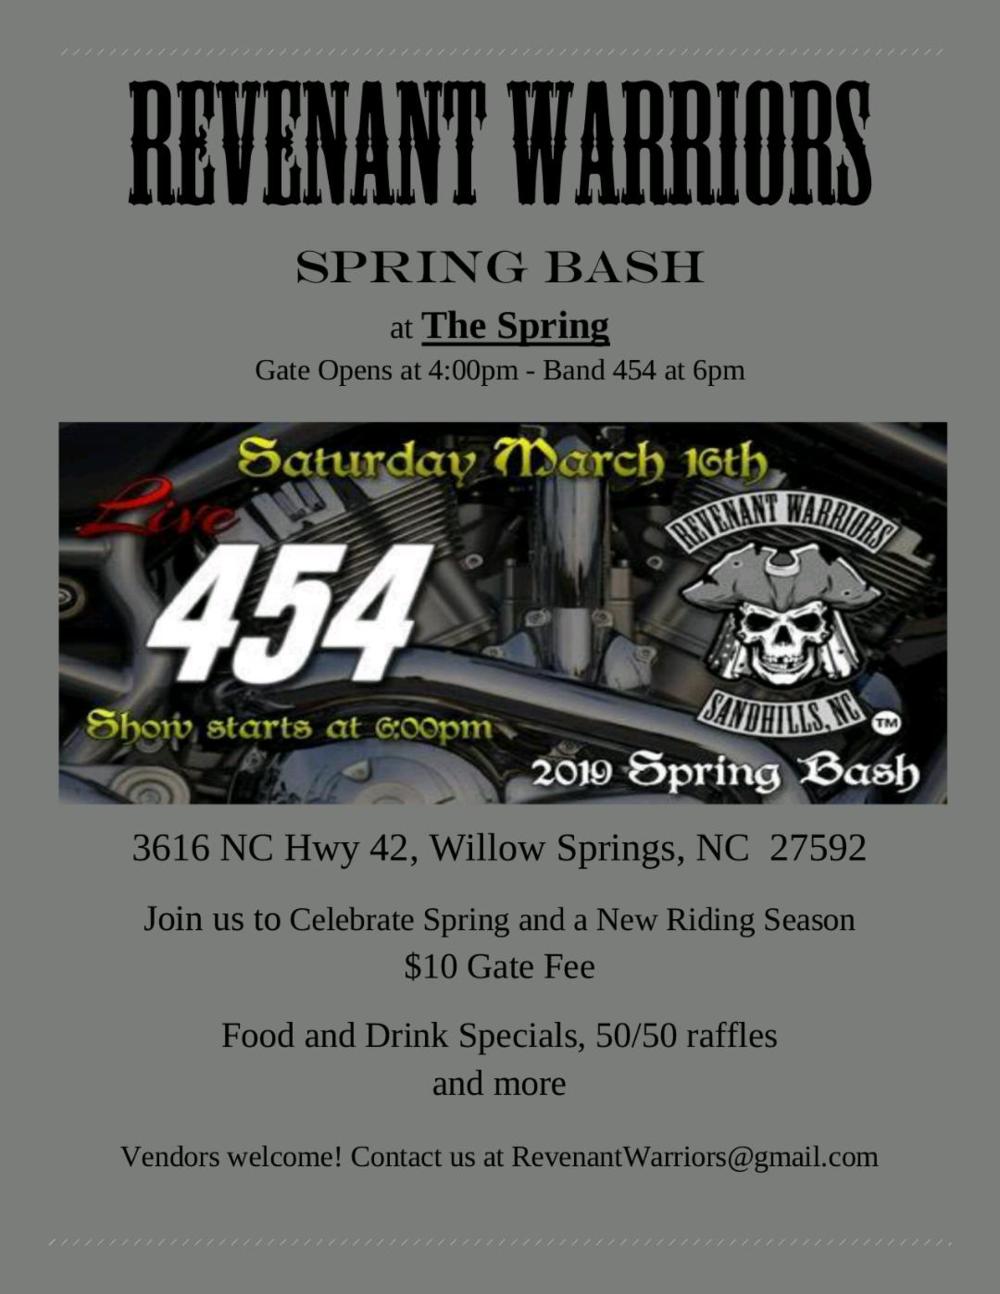 Revenant Warriors.SpringBash.2019.03.png